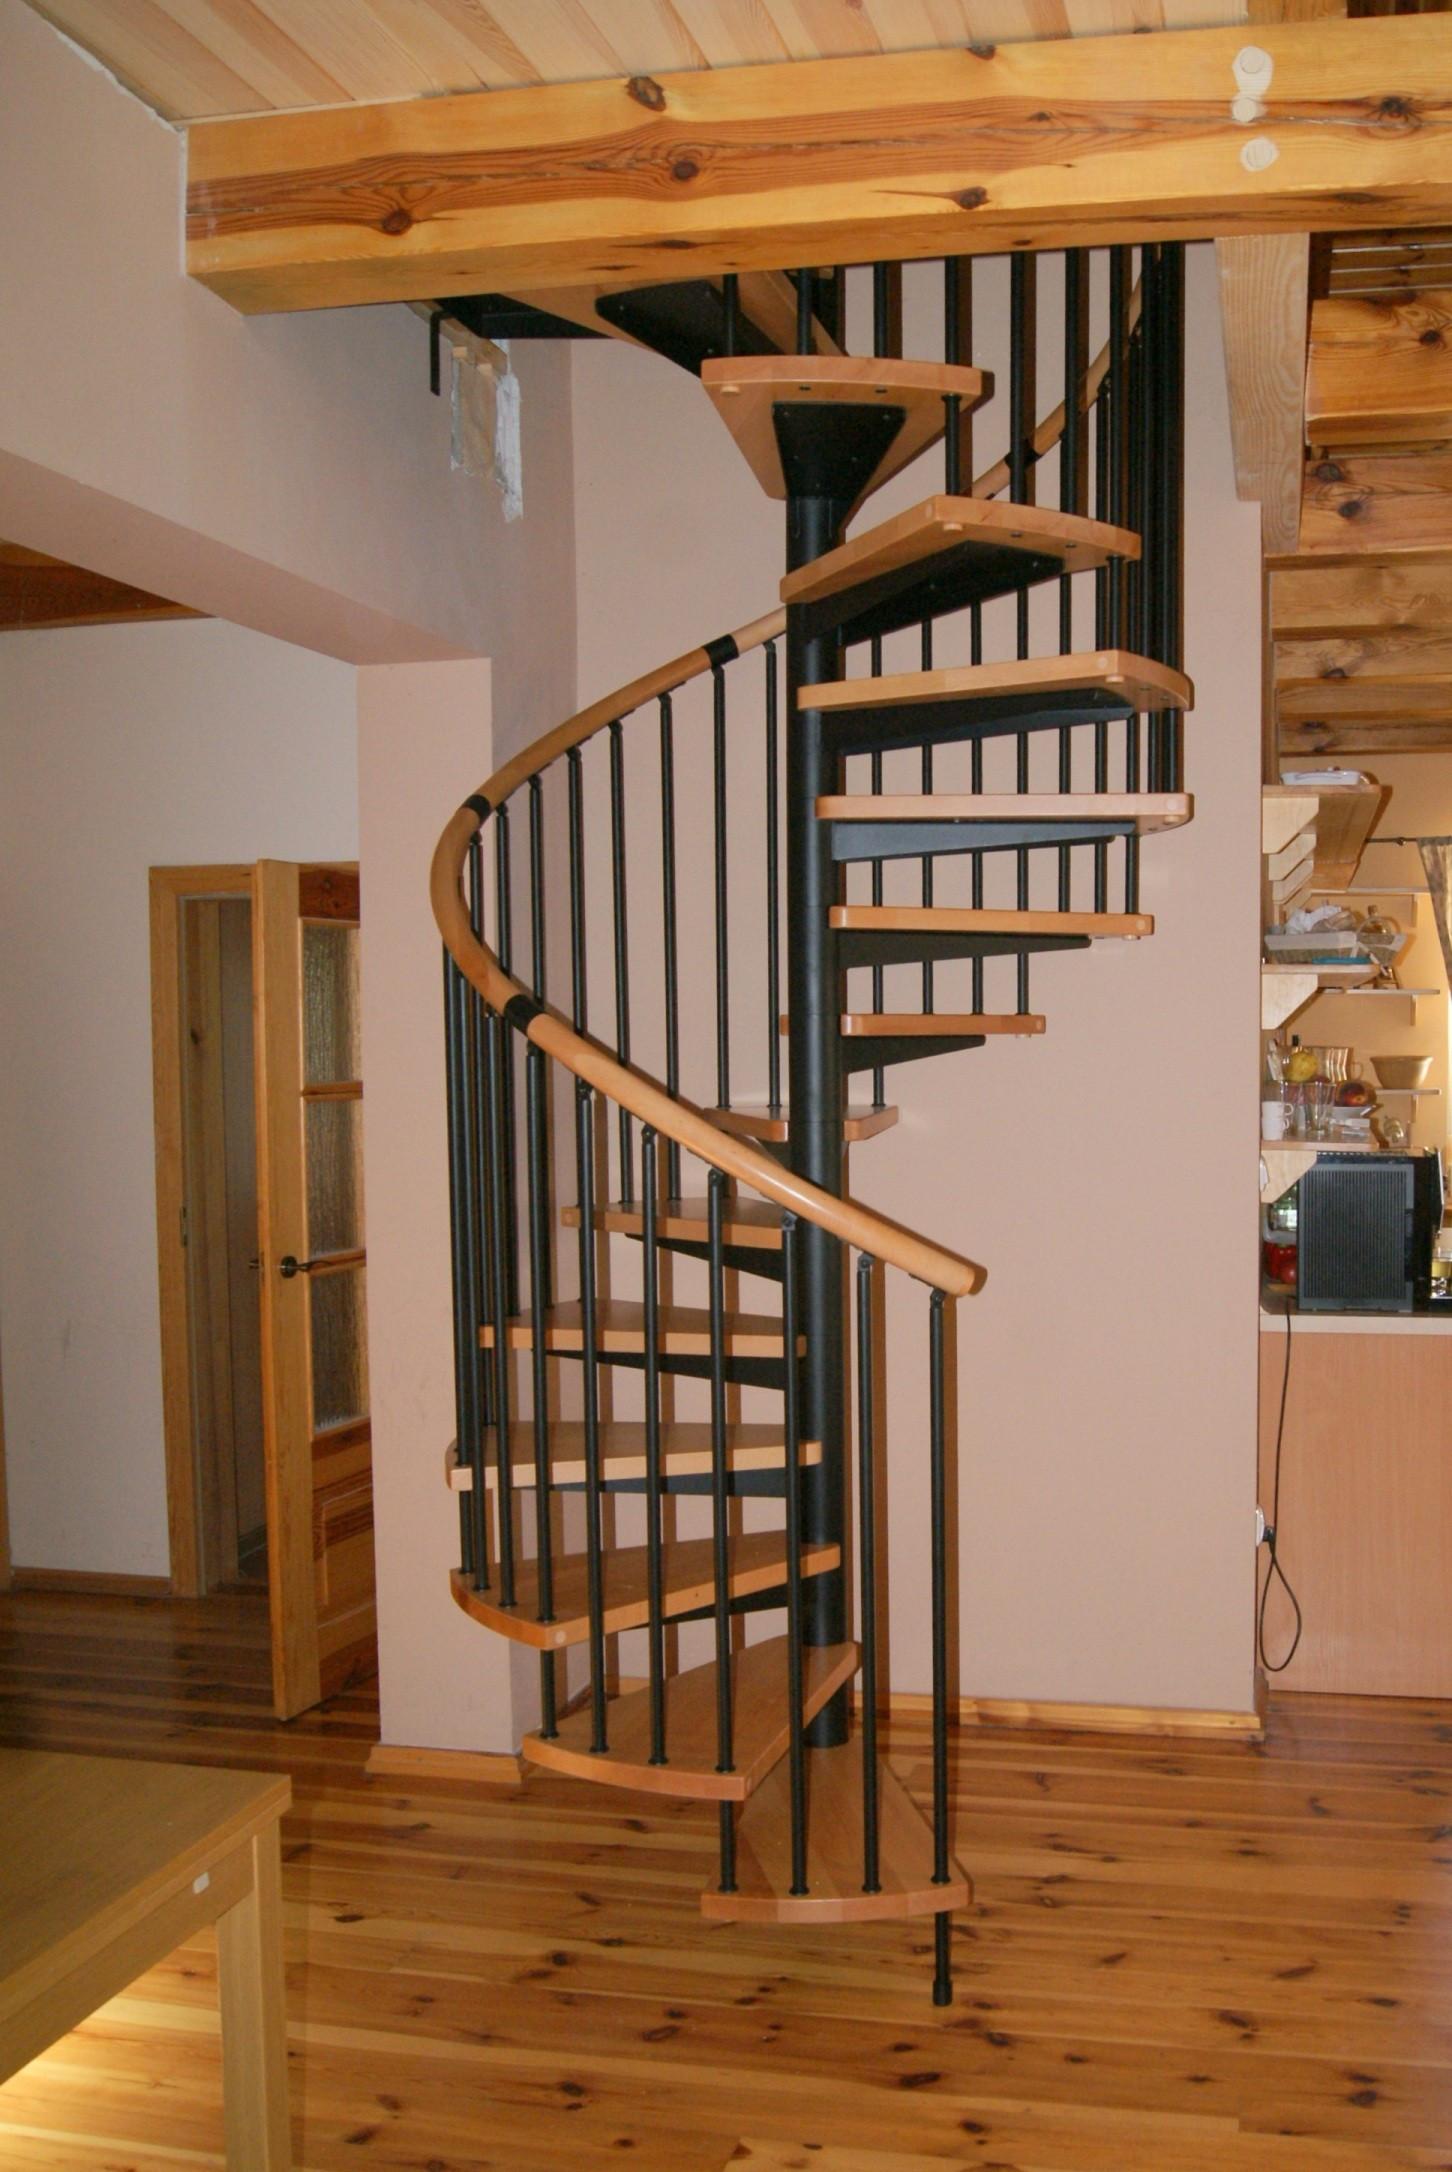 Stairs Hardwood Flooring Cost Of Stairs Winding Duda Model Oslo 02 S 110 Cm Schody24 Net Pl Pertaining to 00p